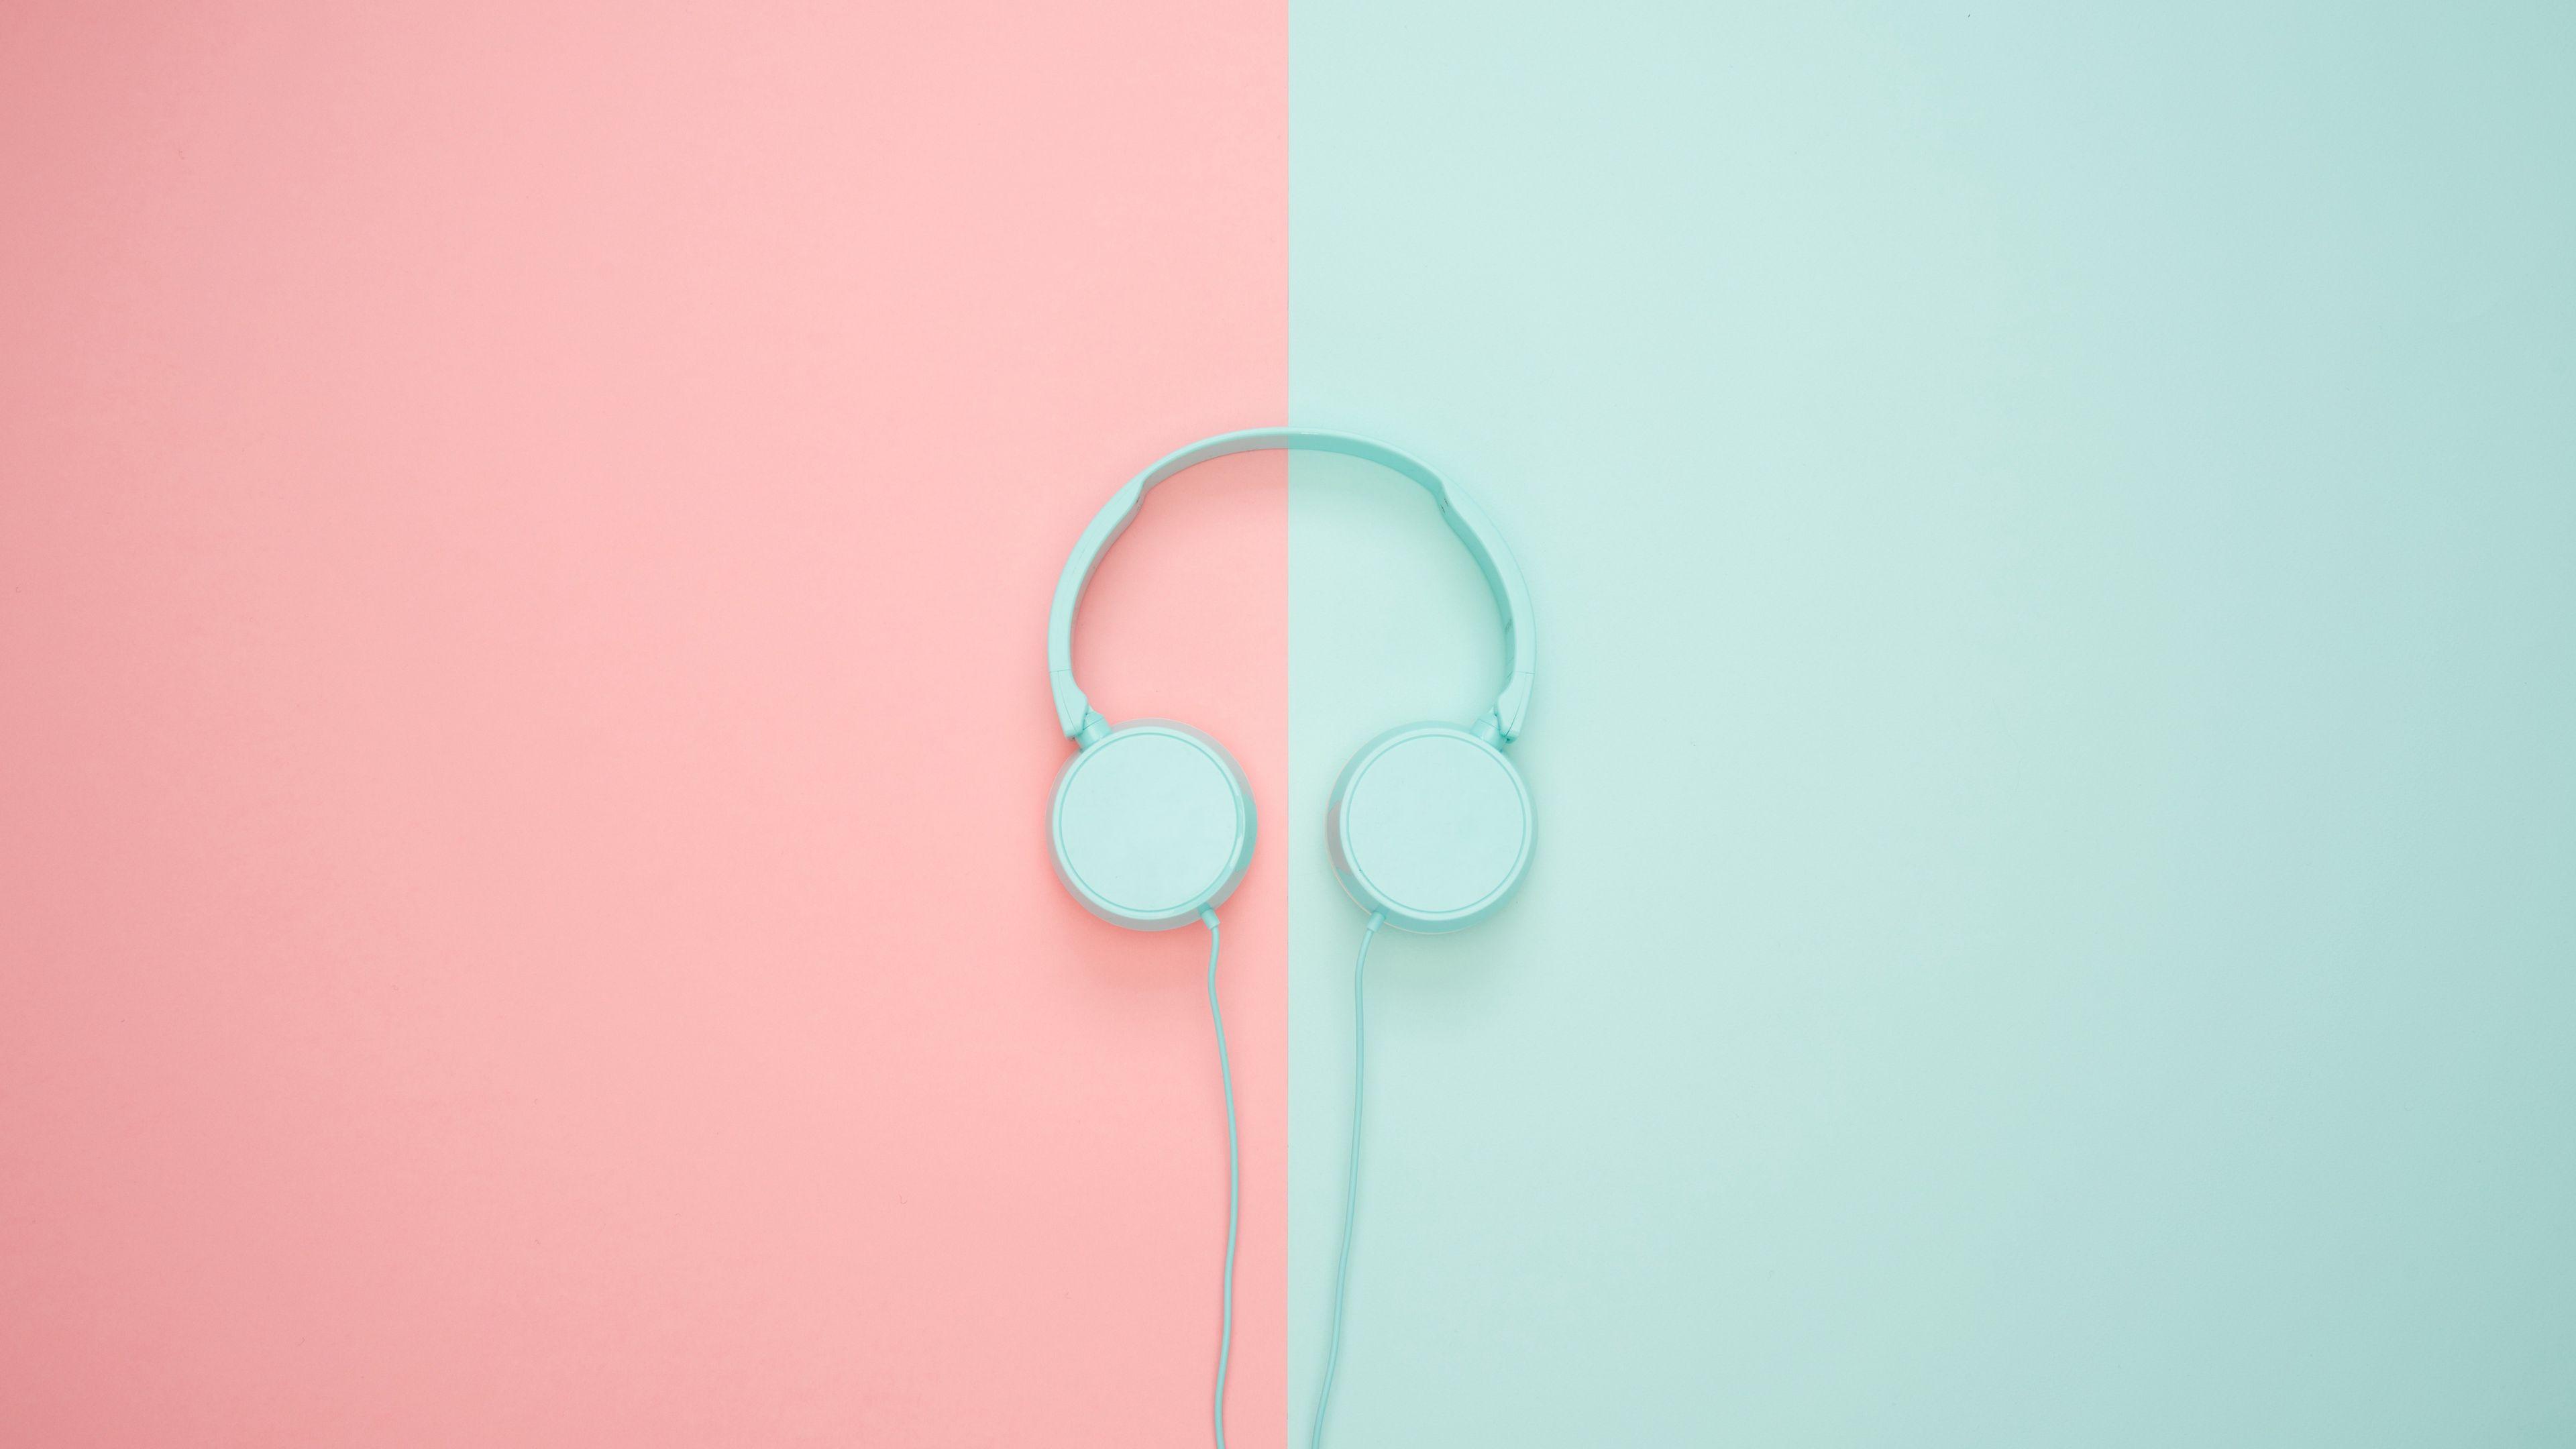 3840x2160 Wallpaper headphones, minimalism, pastel, pink